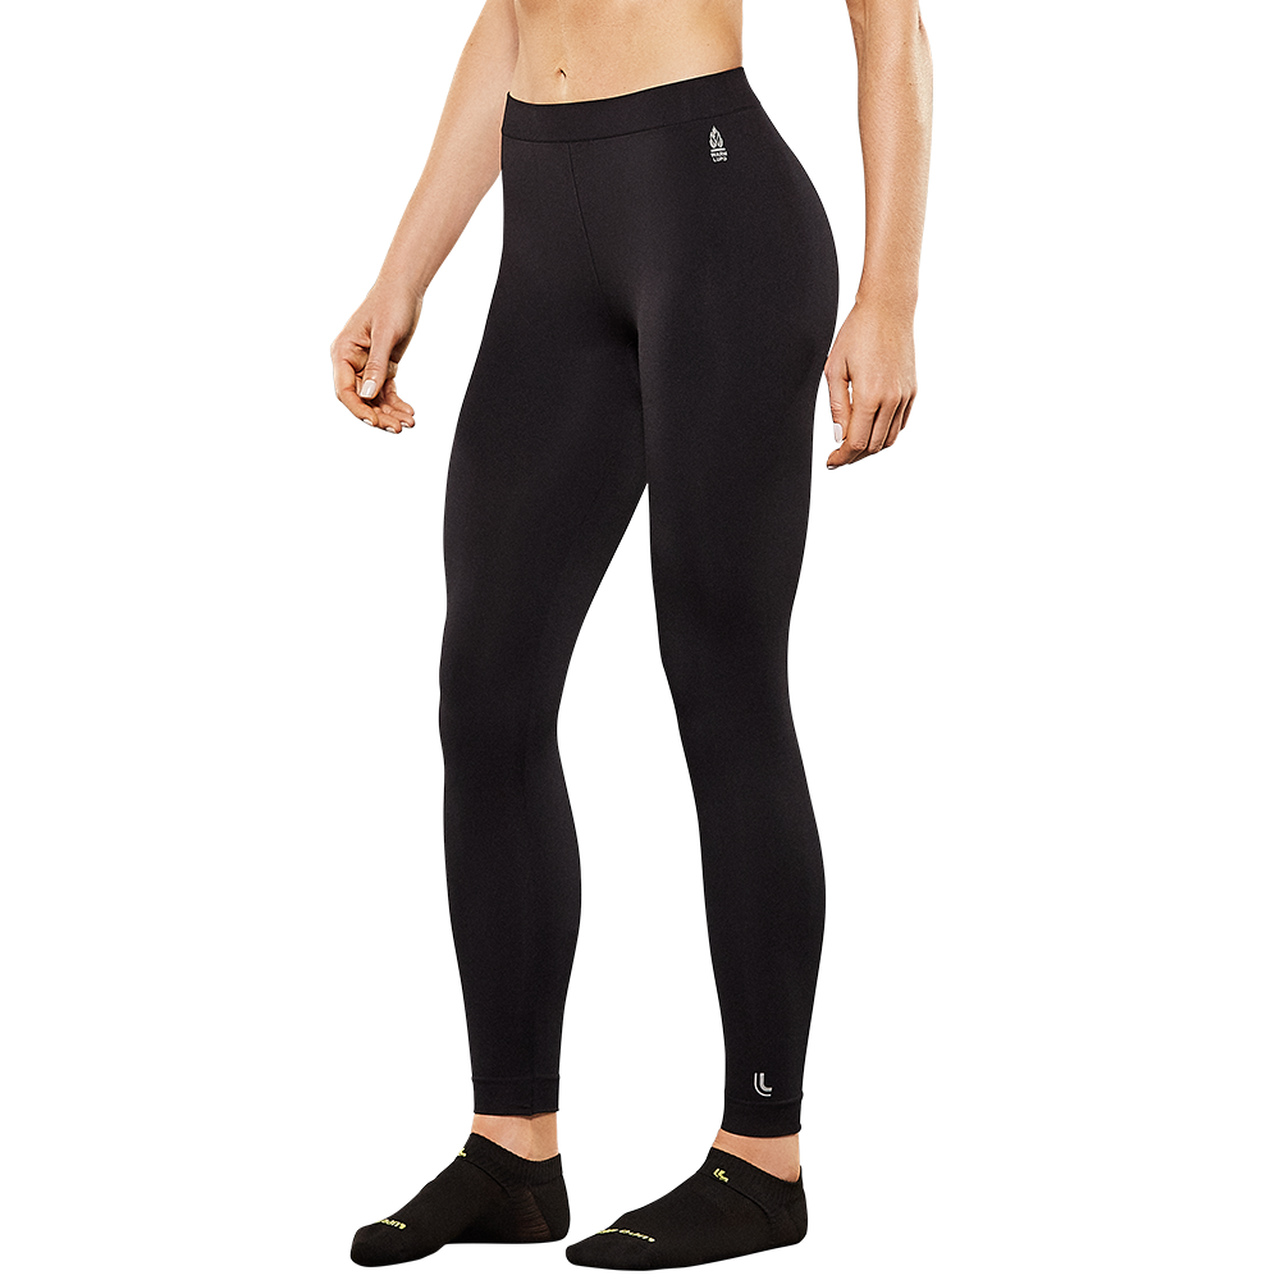 Calça Legging Lupo Térmica Underwear Warm 71582